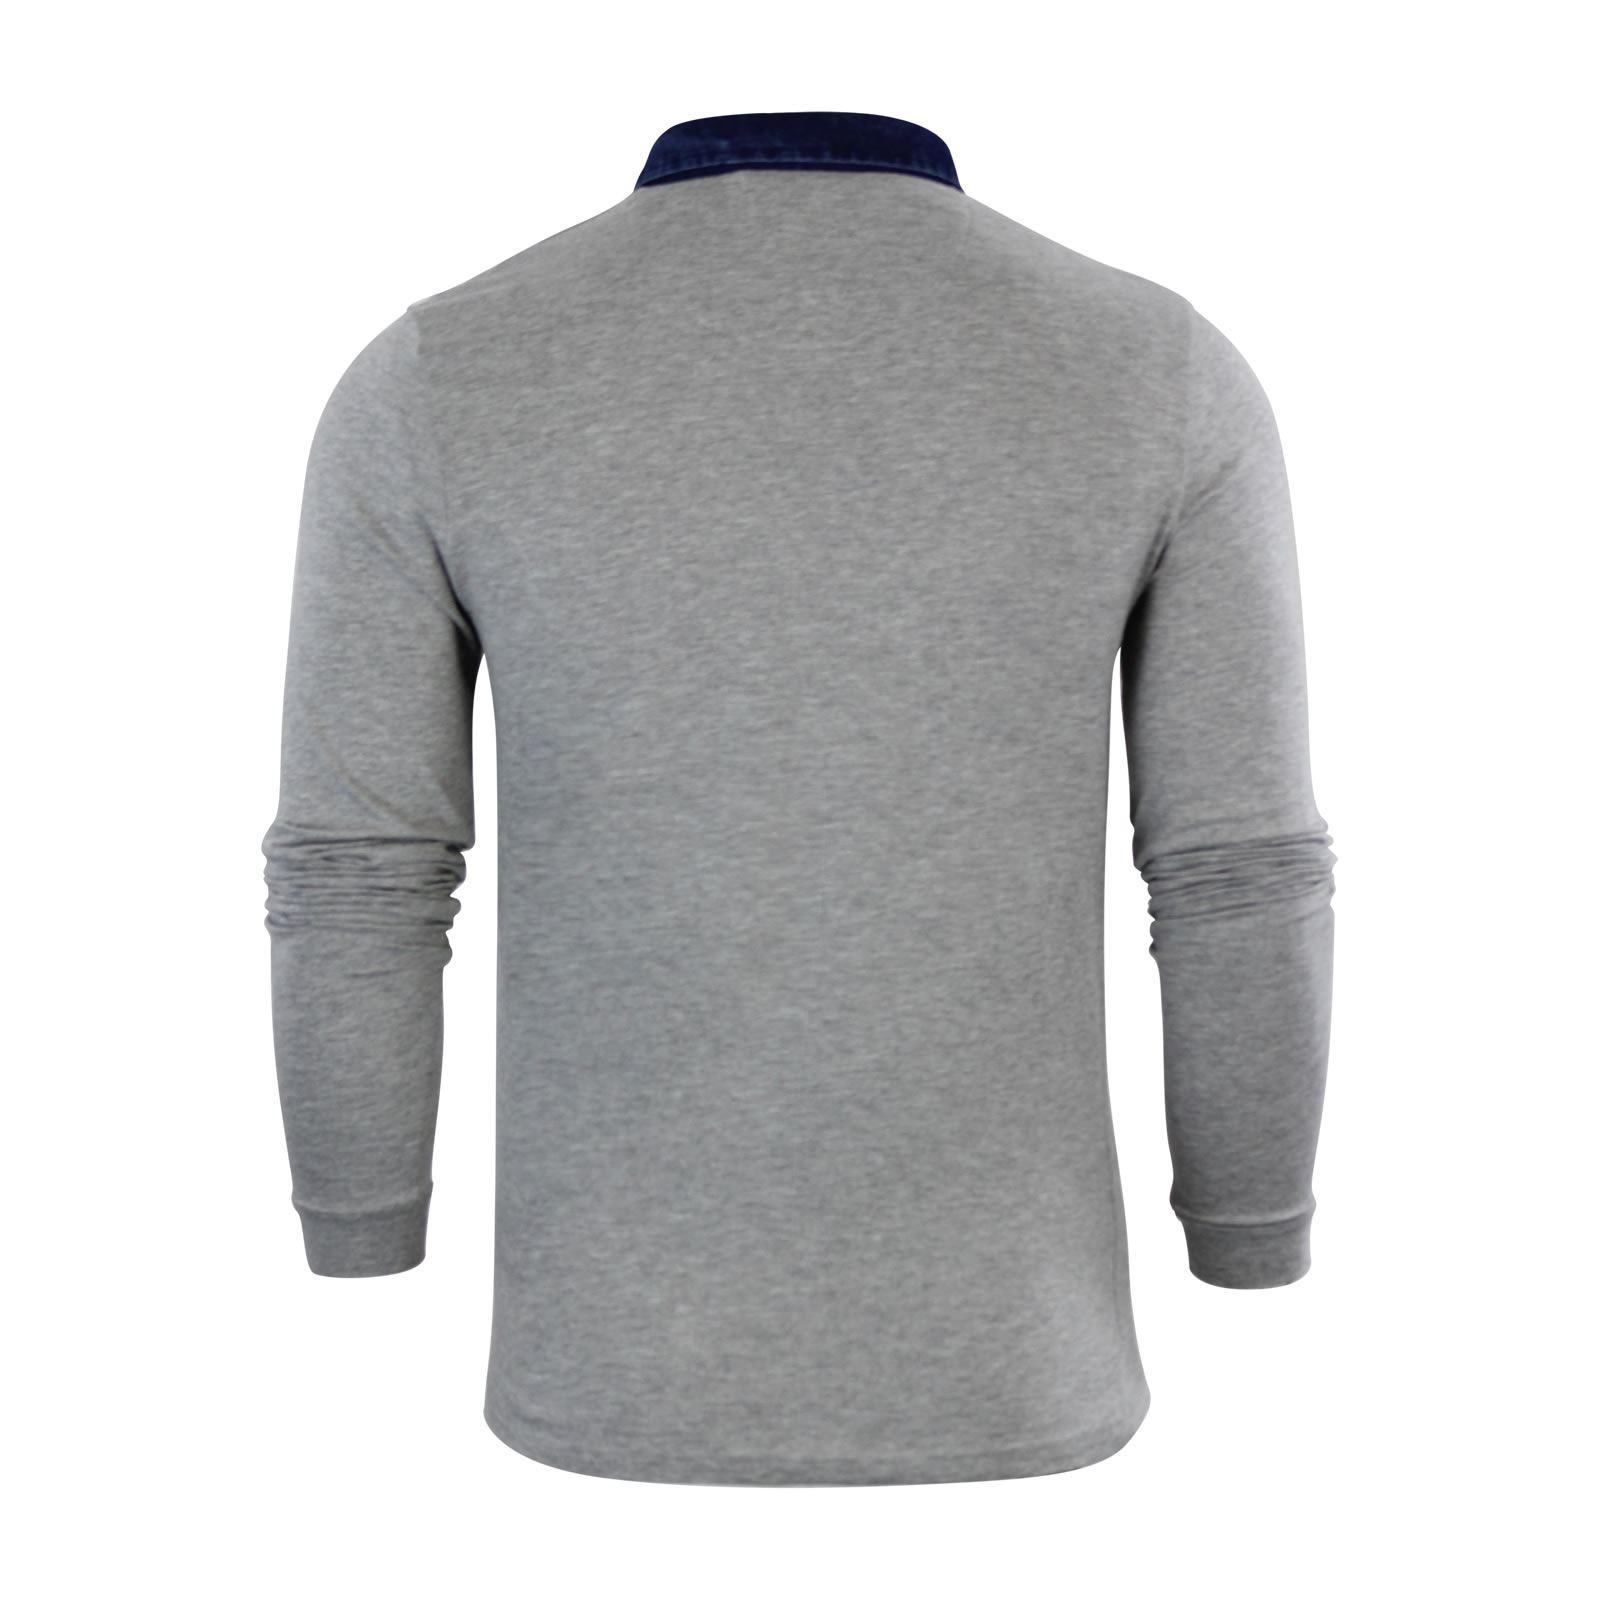 Brave-Soul-Gospel-Homme-Polo-T-Shirt-Denim-a-col-a-manches-longues-Top-Casual miniature 9